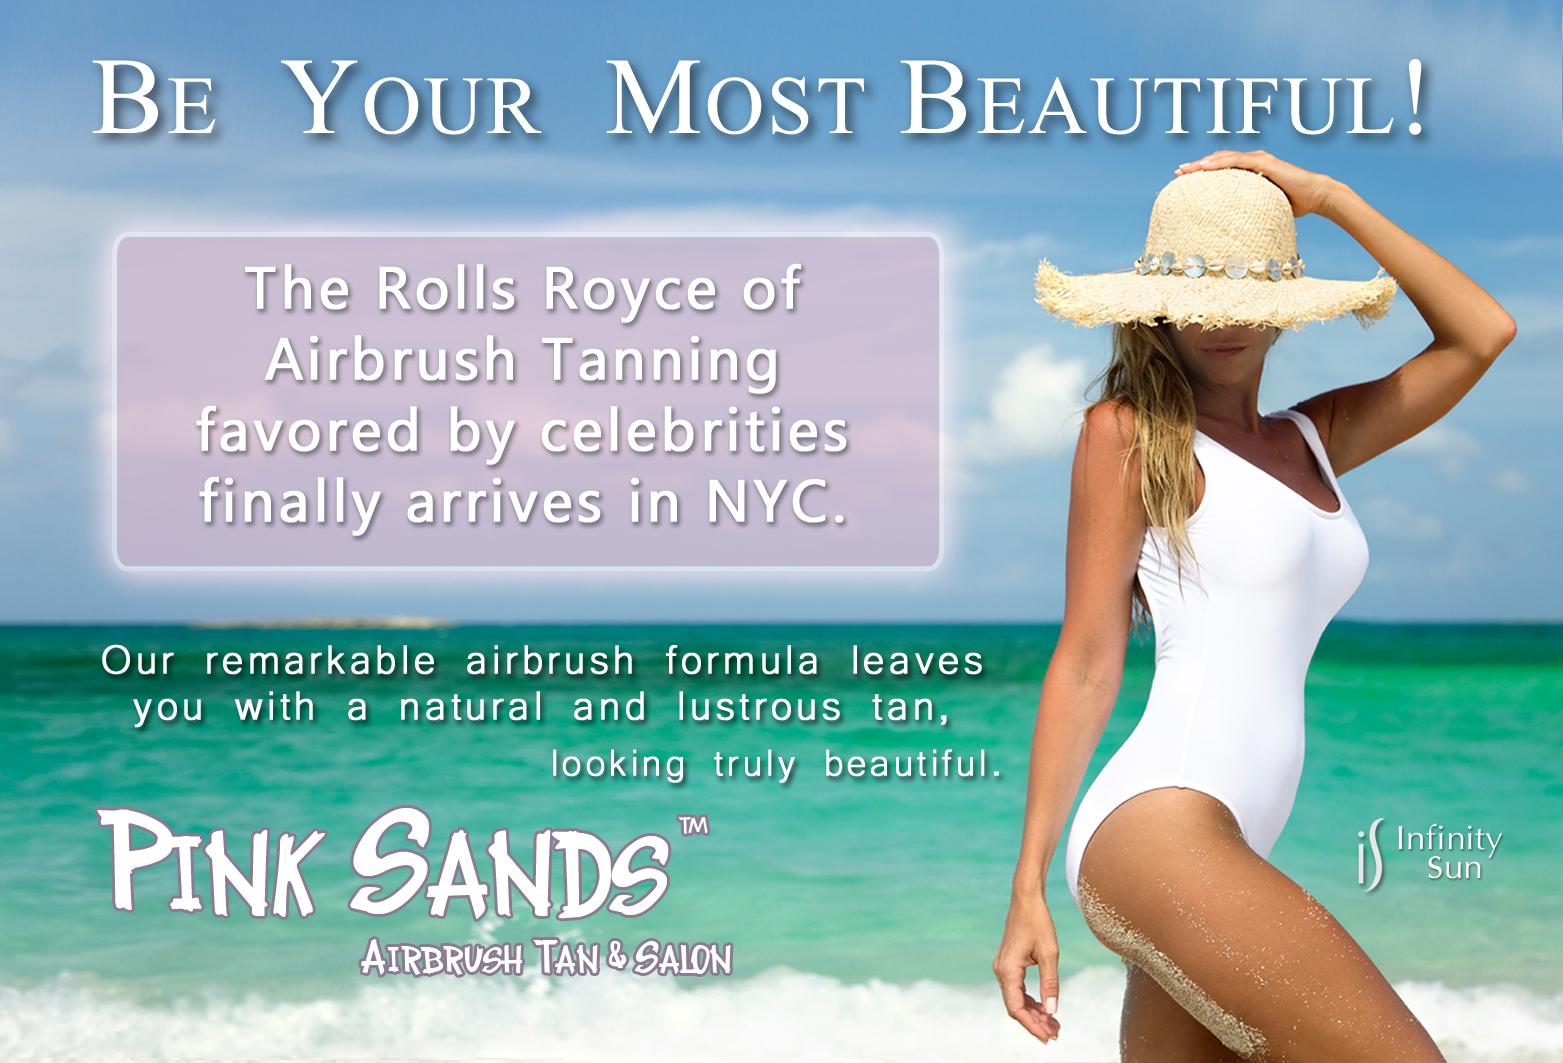 Pink Sands Llc En New York Ny Salones De Bronceado